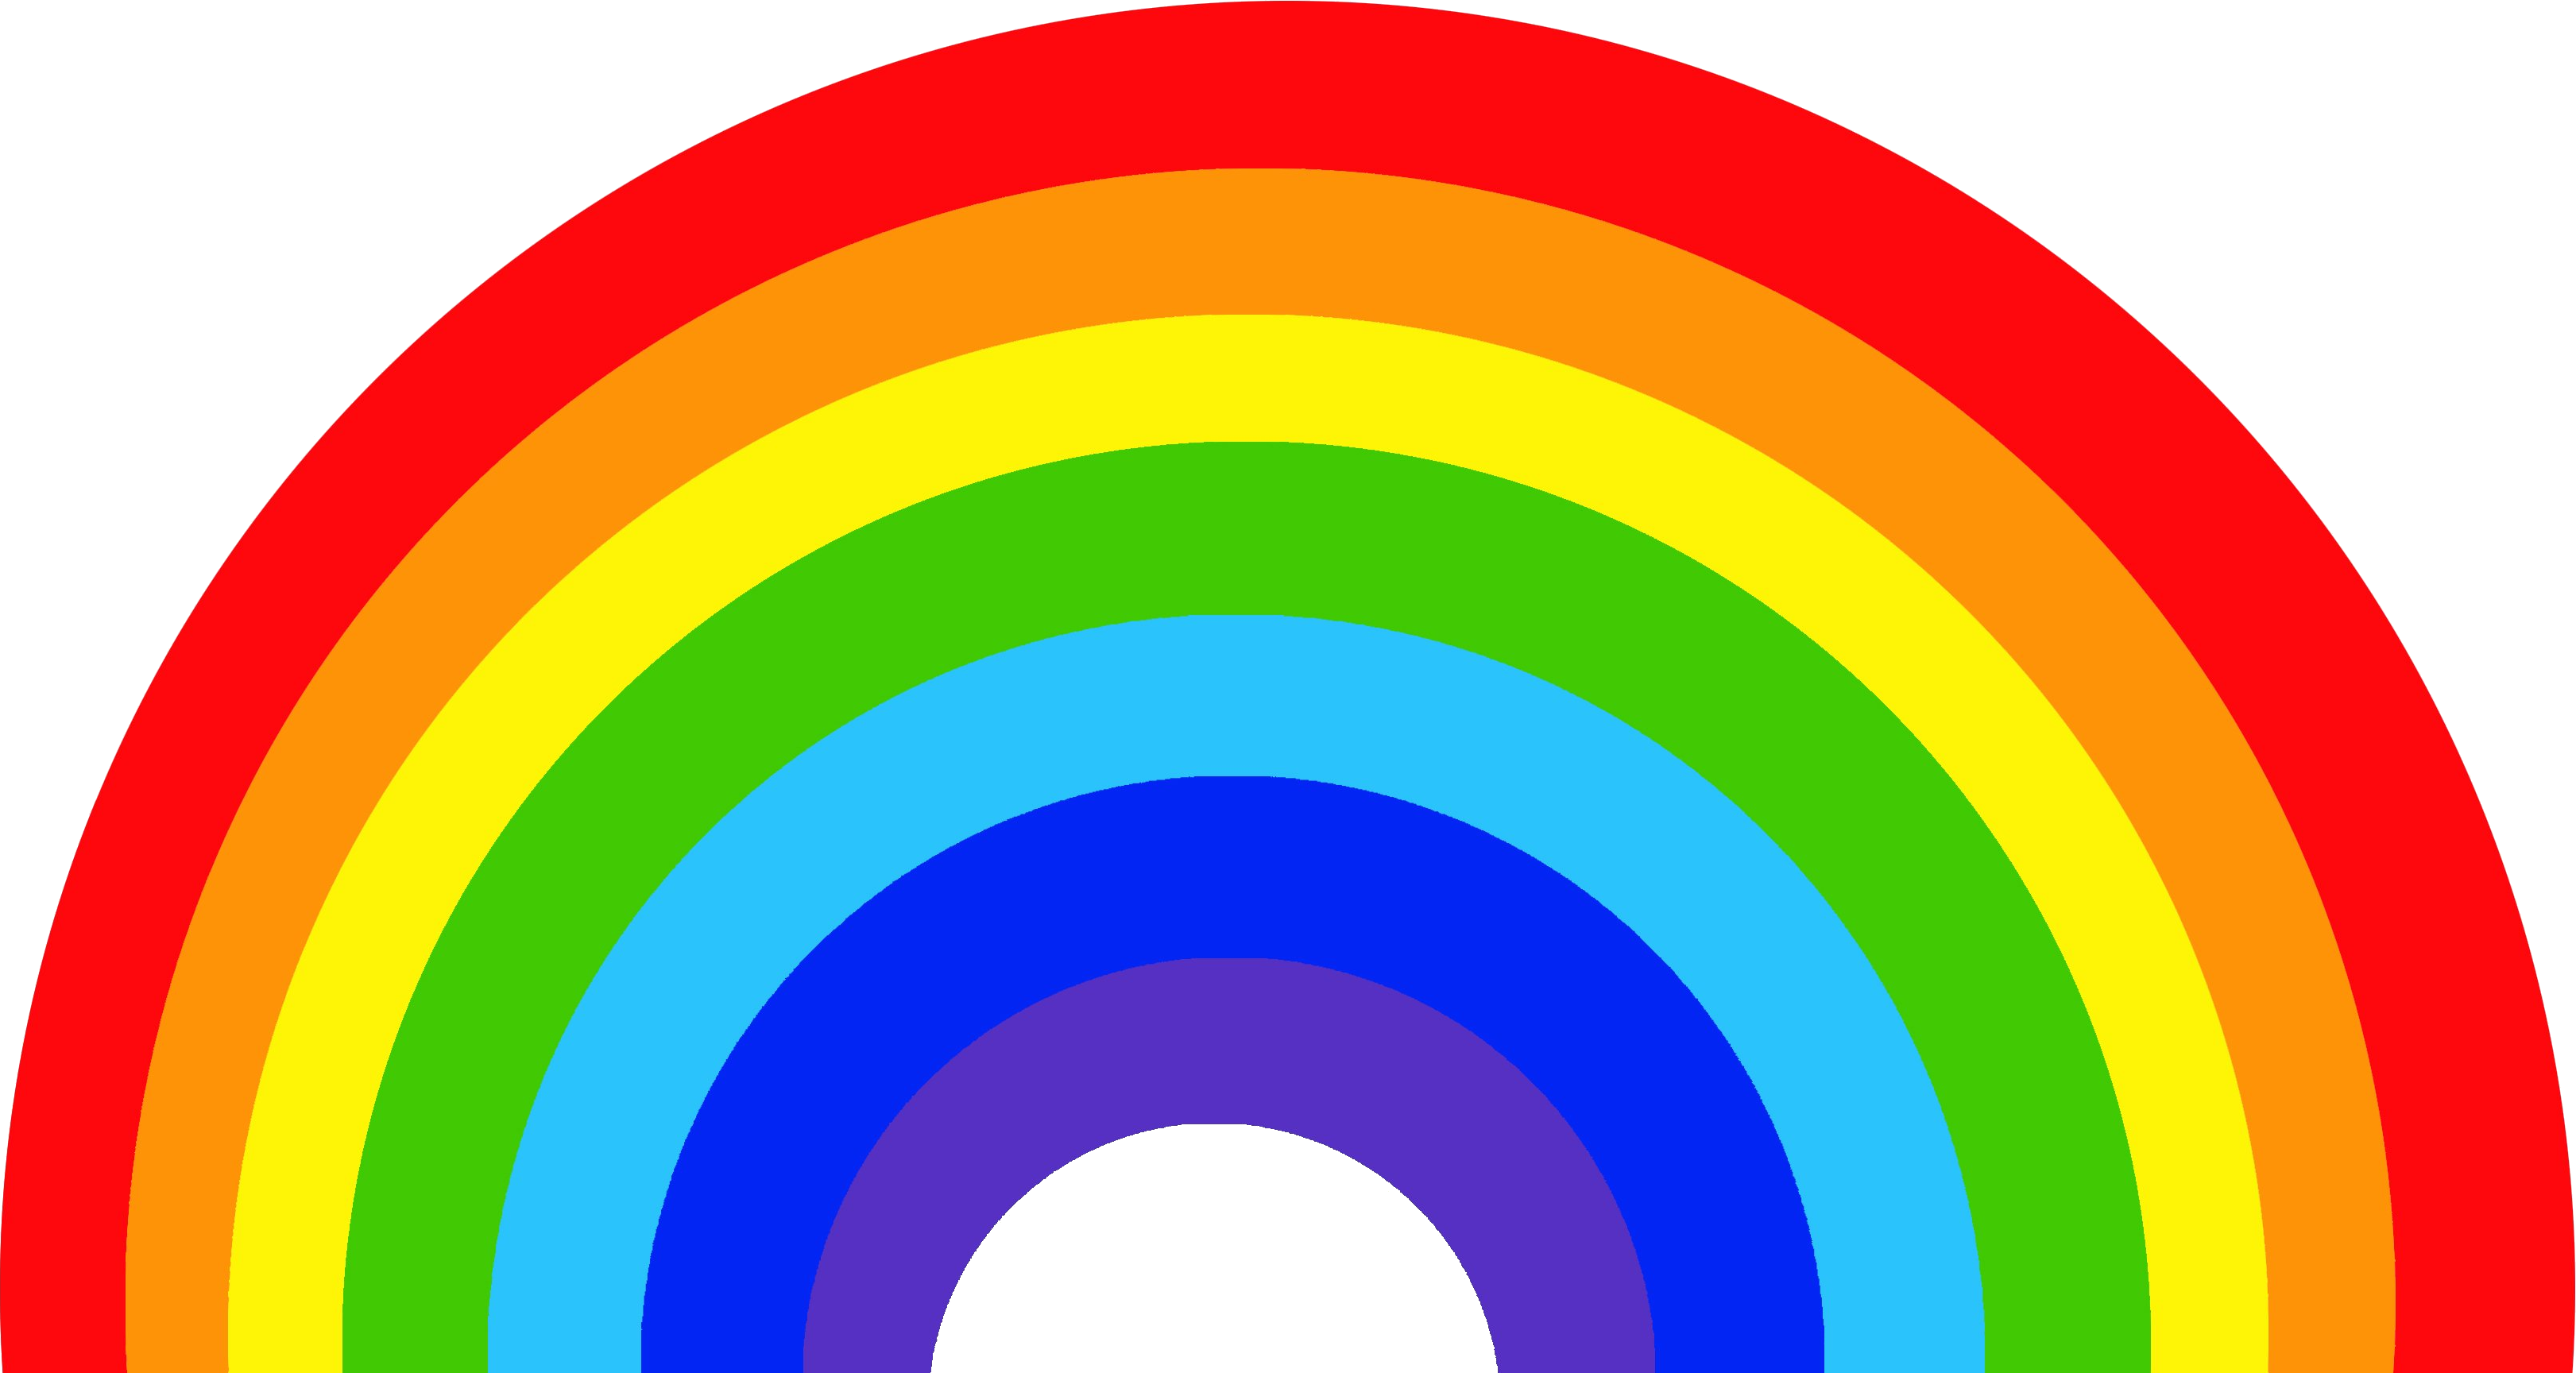 rainbow_PNG5580